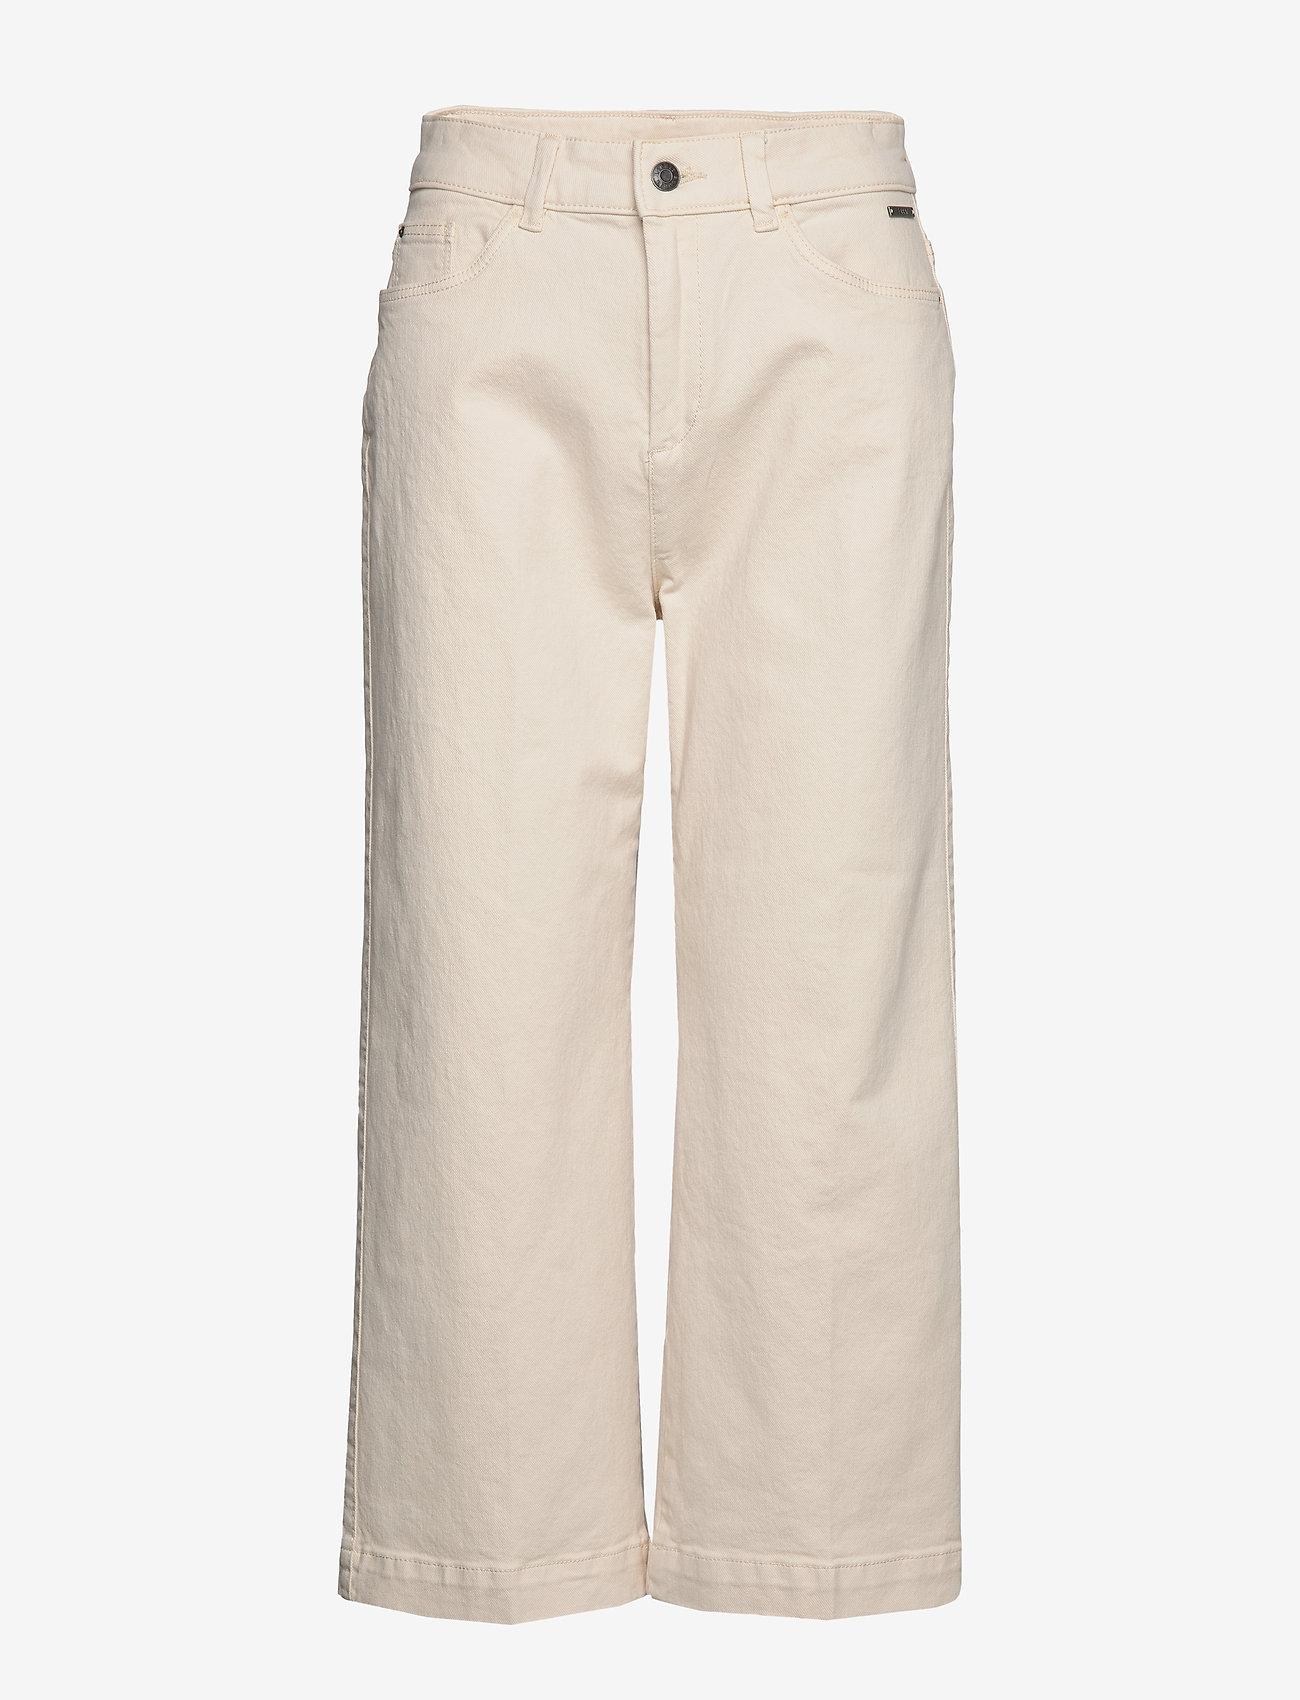 Esprit Casual - Pants woven - vide bukser - ice - 0